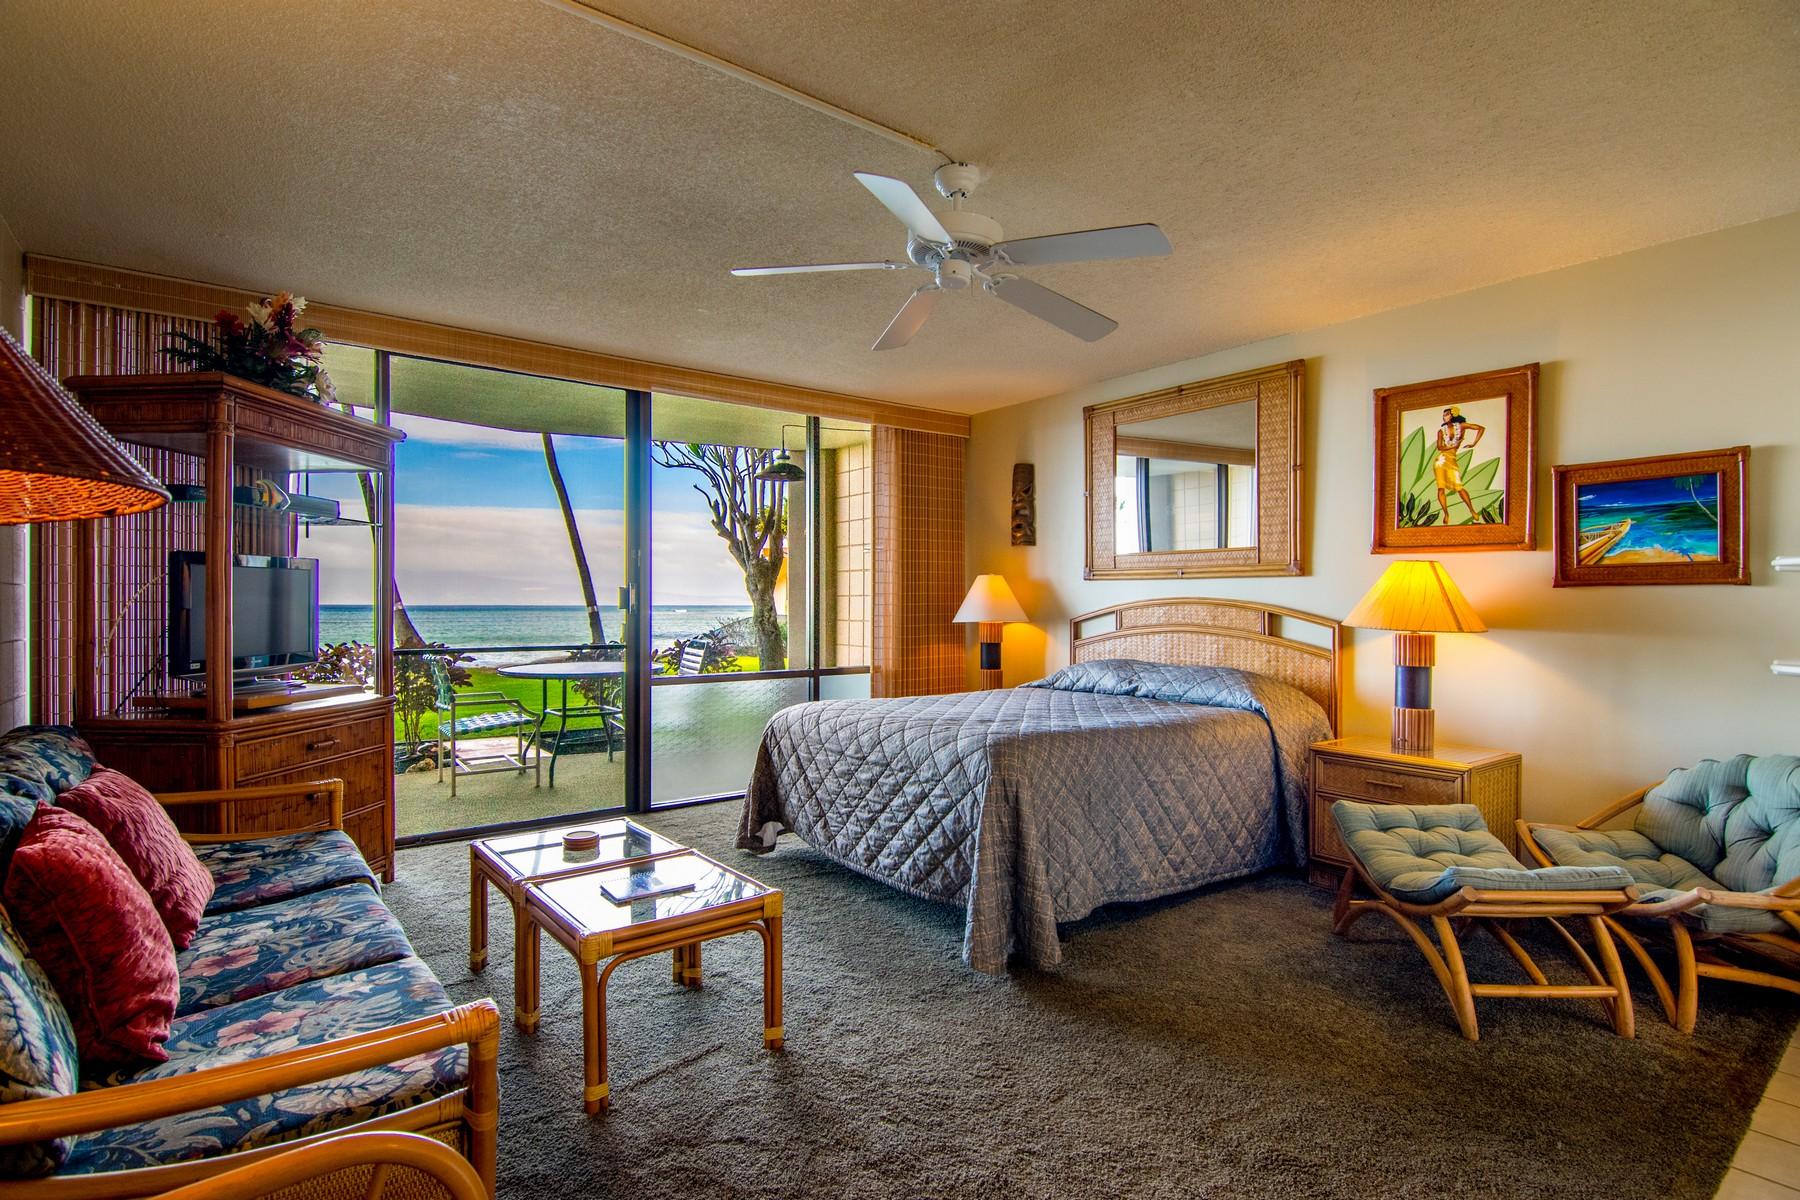 共管式独立产权公寓 为 销售 在 Stunning Sunset Views & Direct Ocean Front Condo 4327 Lower Honoapiilani Road, Valley Isle Resort 107 卡哈纳, 夏威夷, 96761 美国